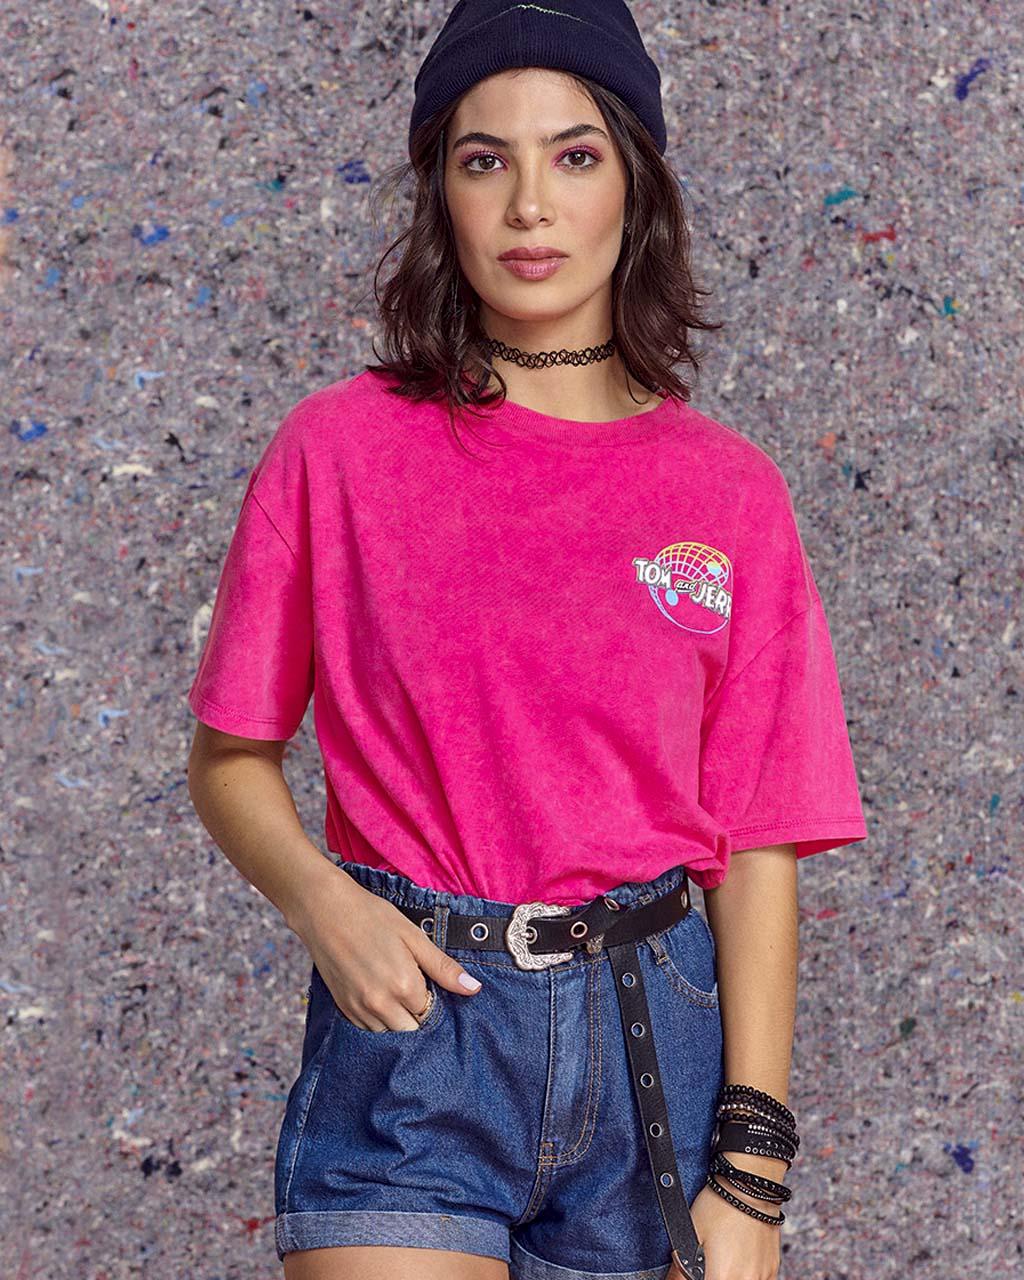 T-Shirt Teen Beija Cós Pink Lavada Tom and Jerry Authoria